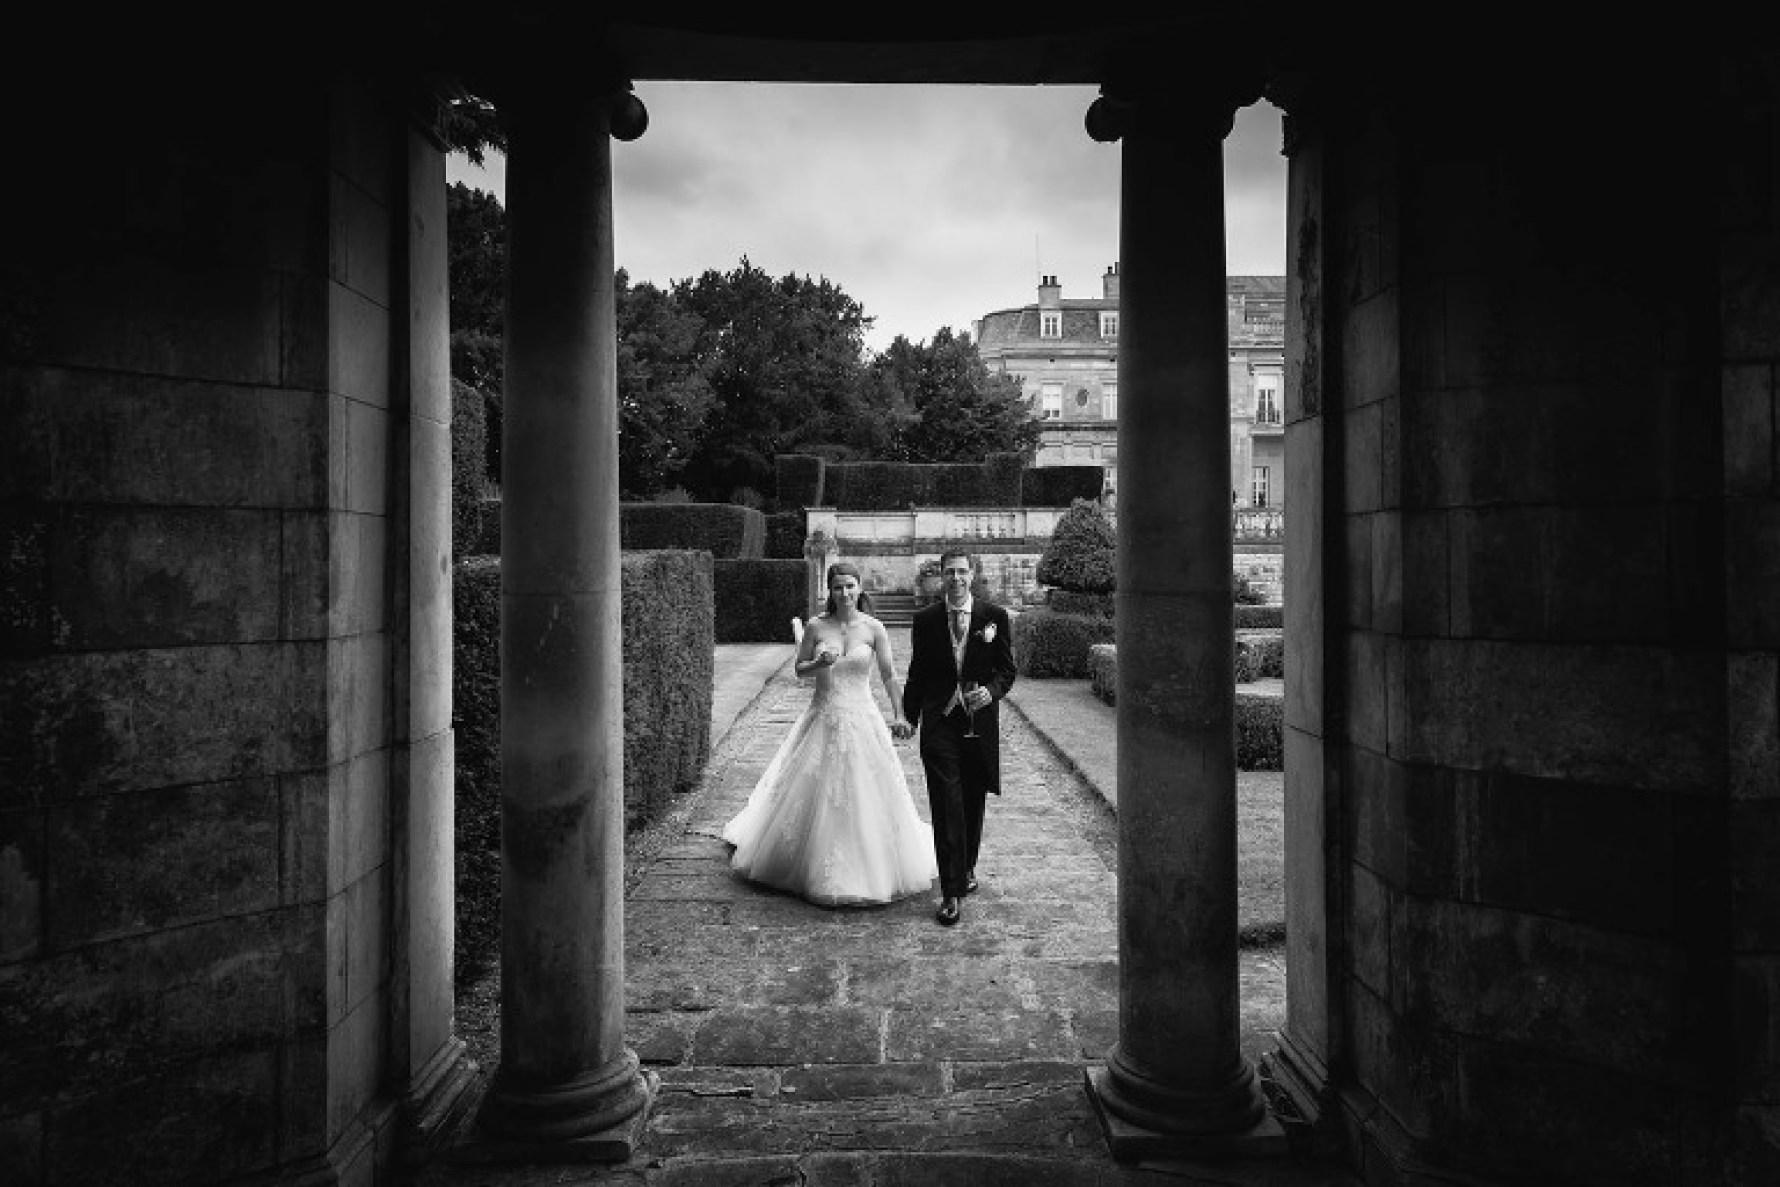 Bedfordshire wedding in the gardens of Luton Hoo Hotel